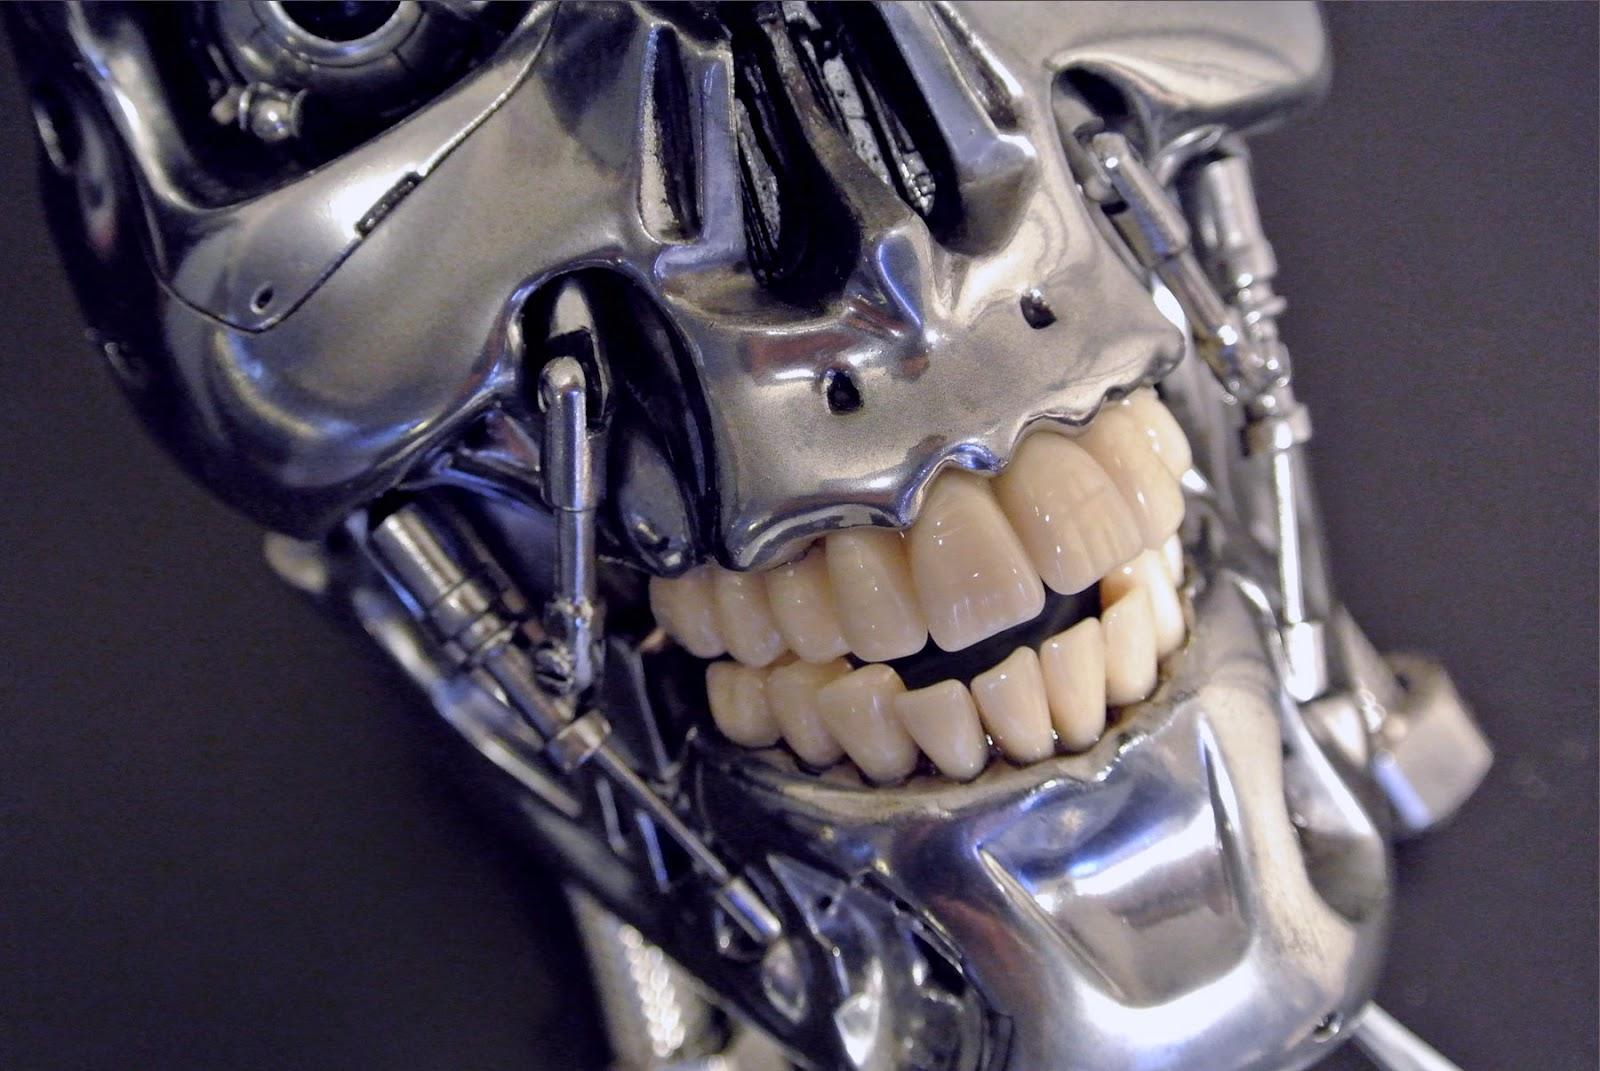 T800 101 Building A Terminator Endo Skull June 2014